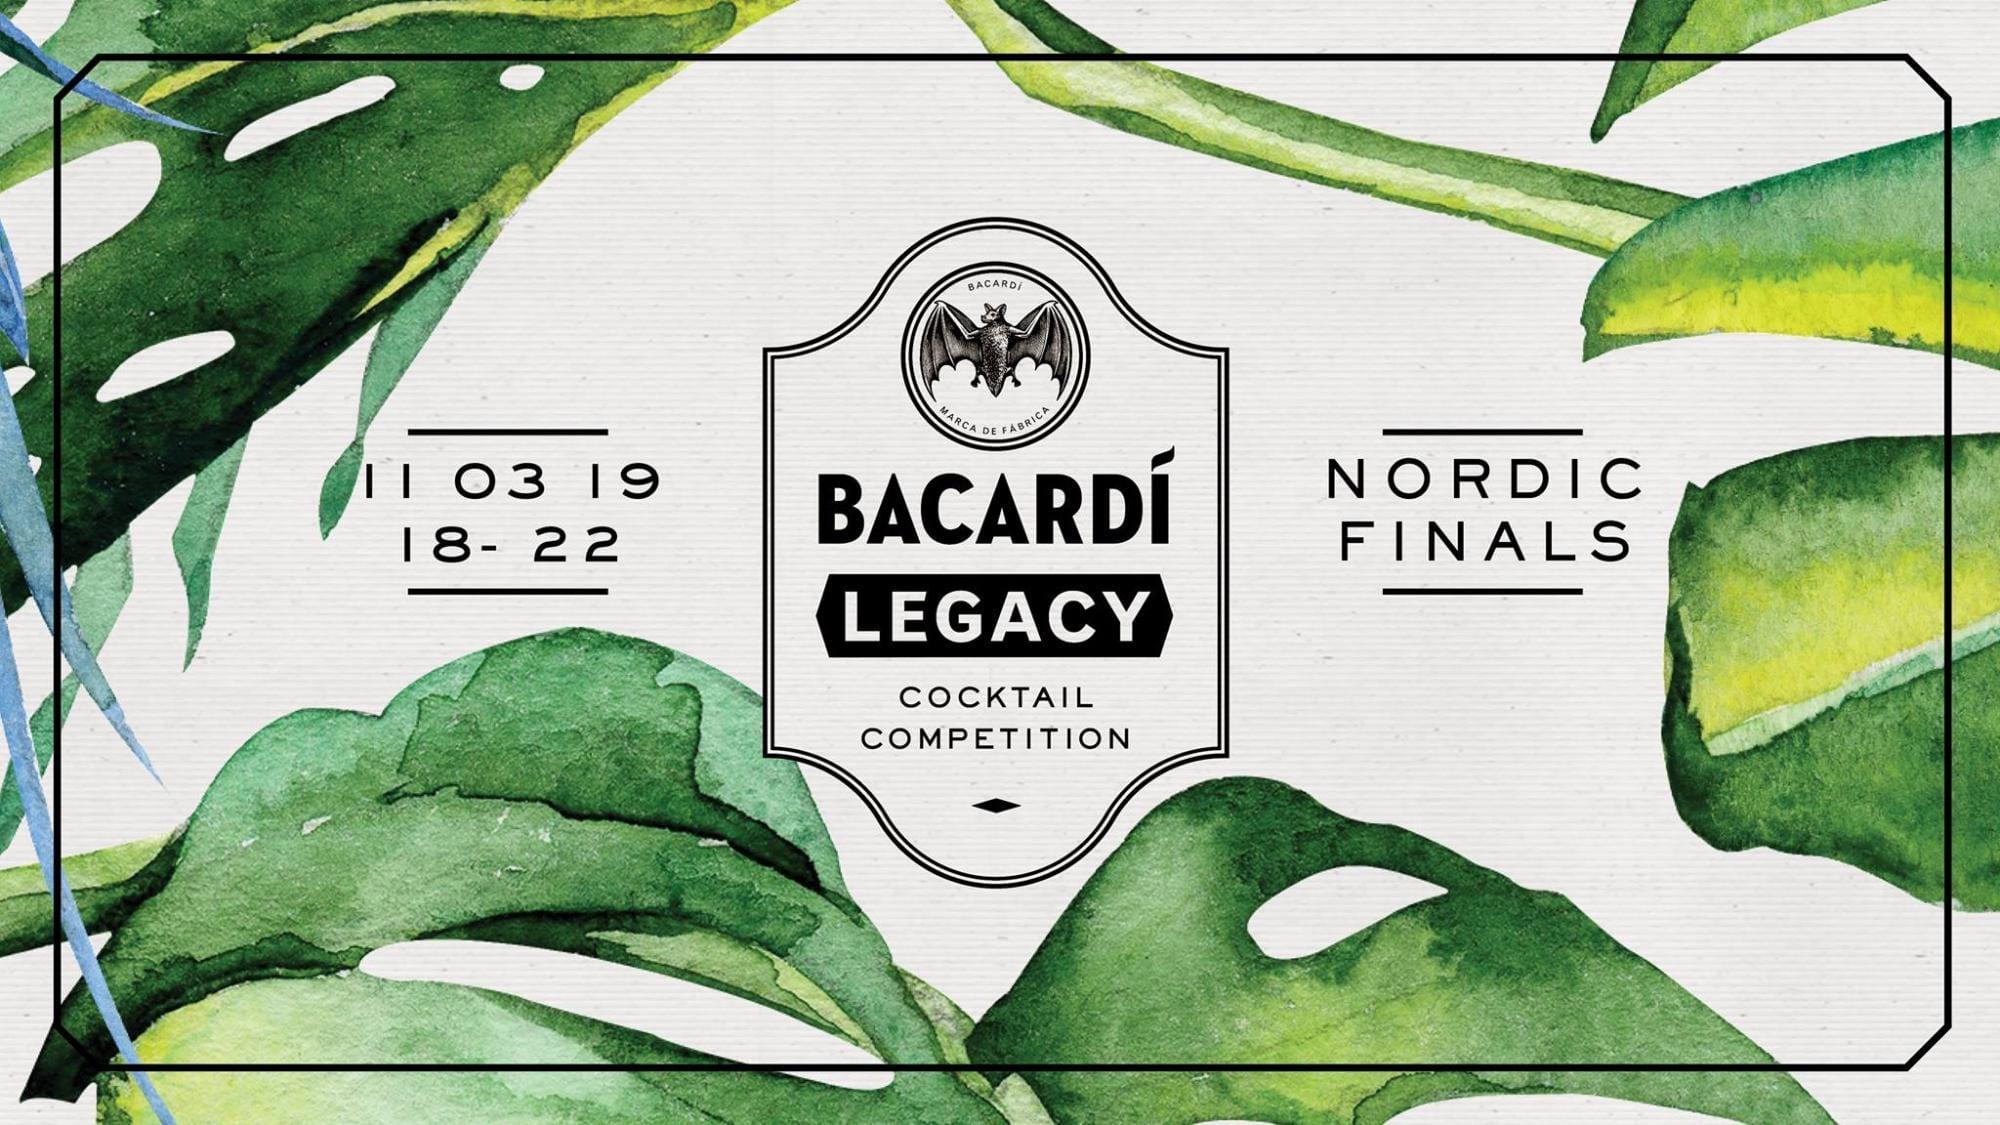 Bacardi Legacy Nordic Final